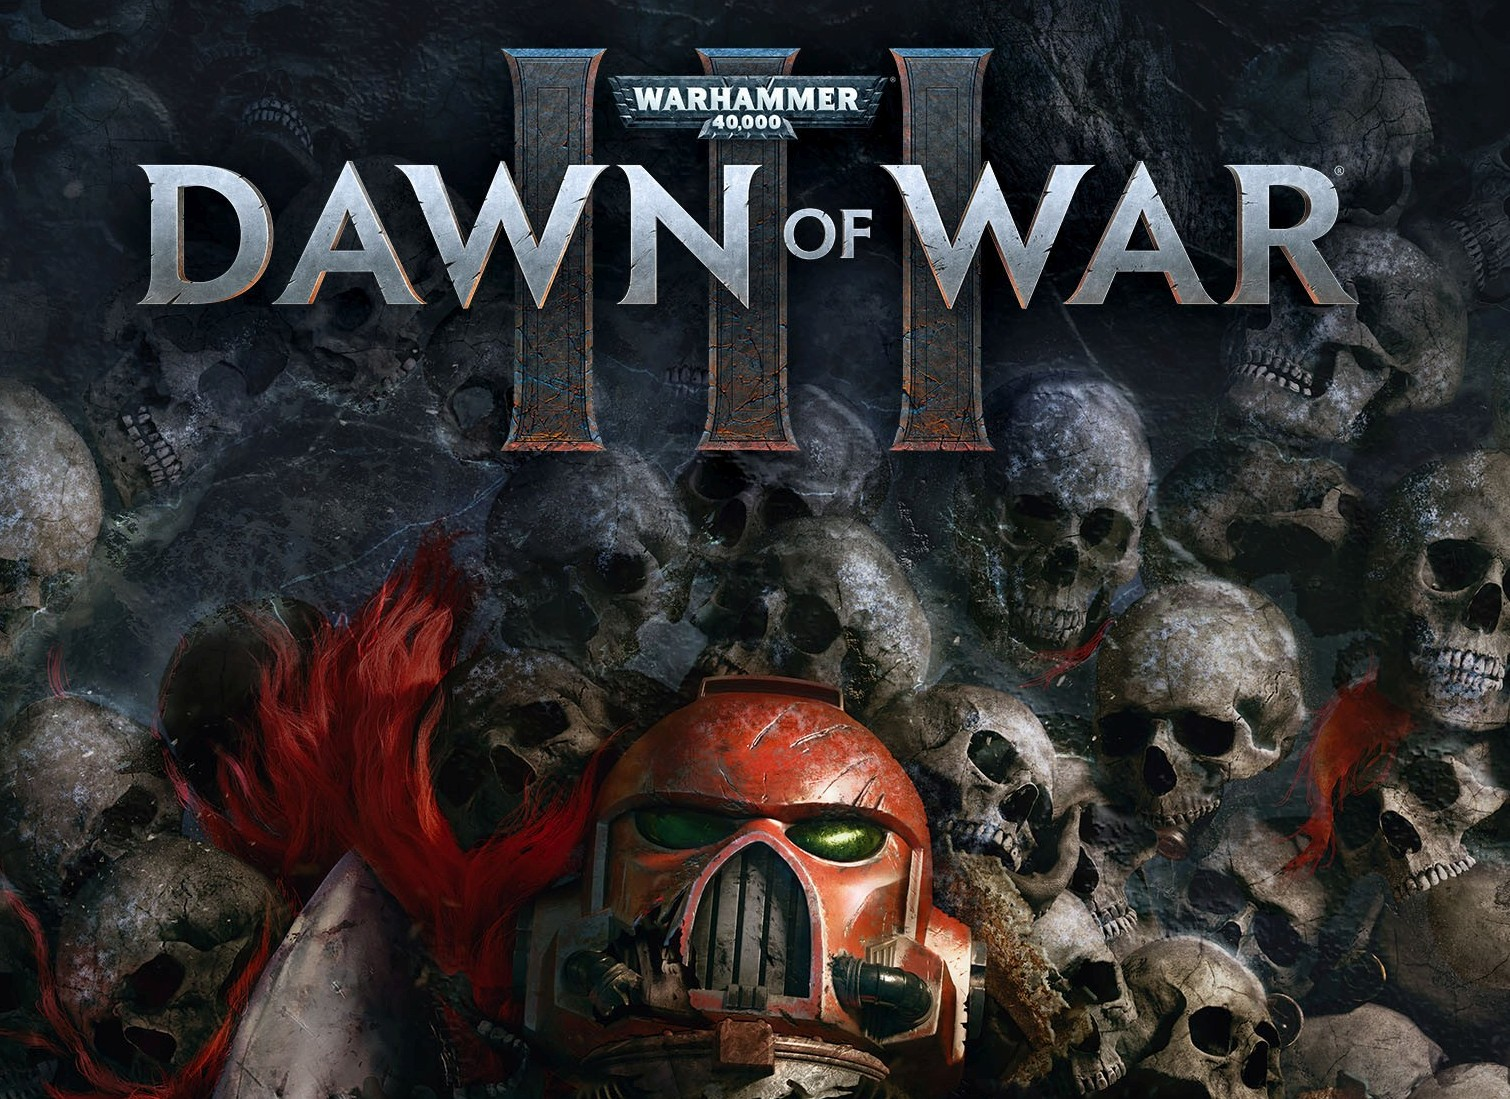 Warhammer 40000 Dawn Of War III Announced Trailer The